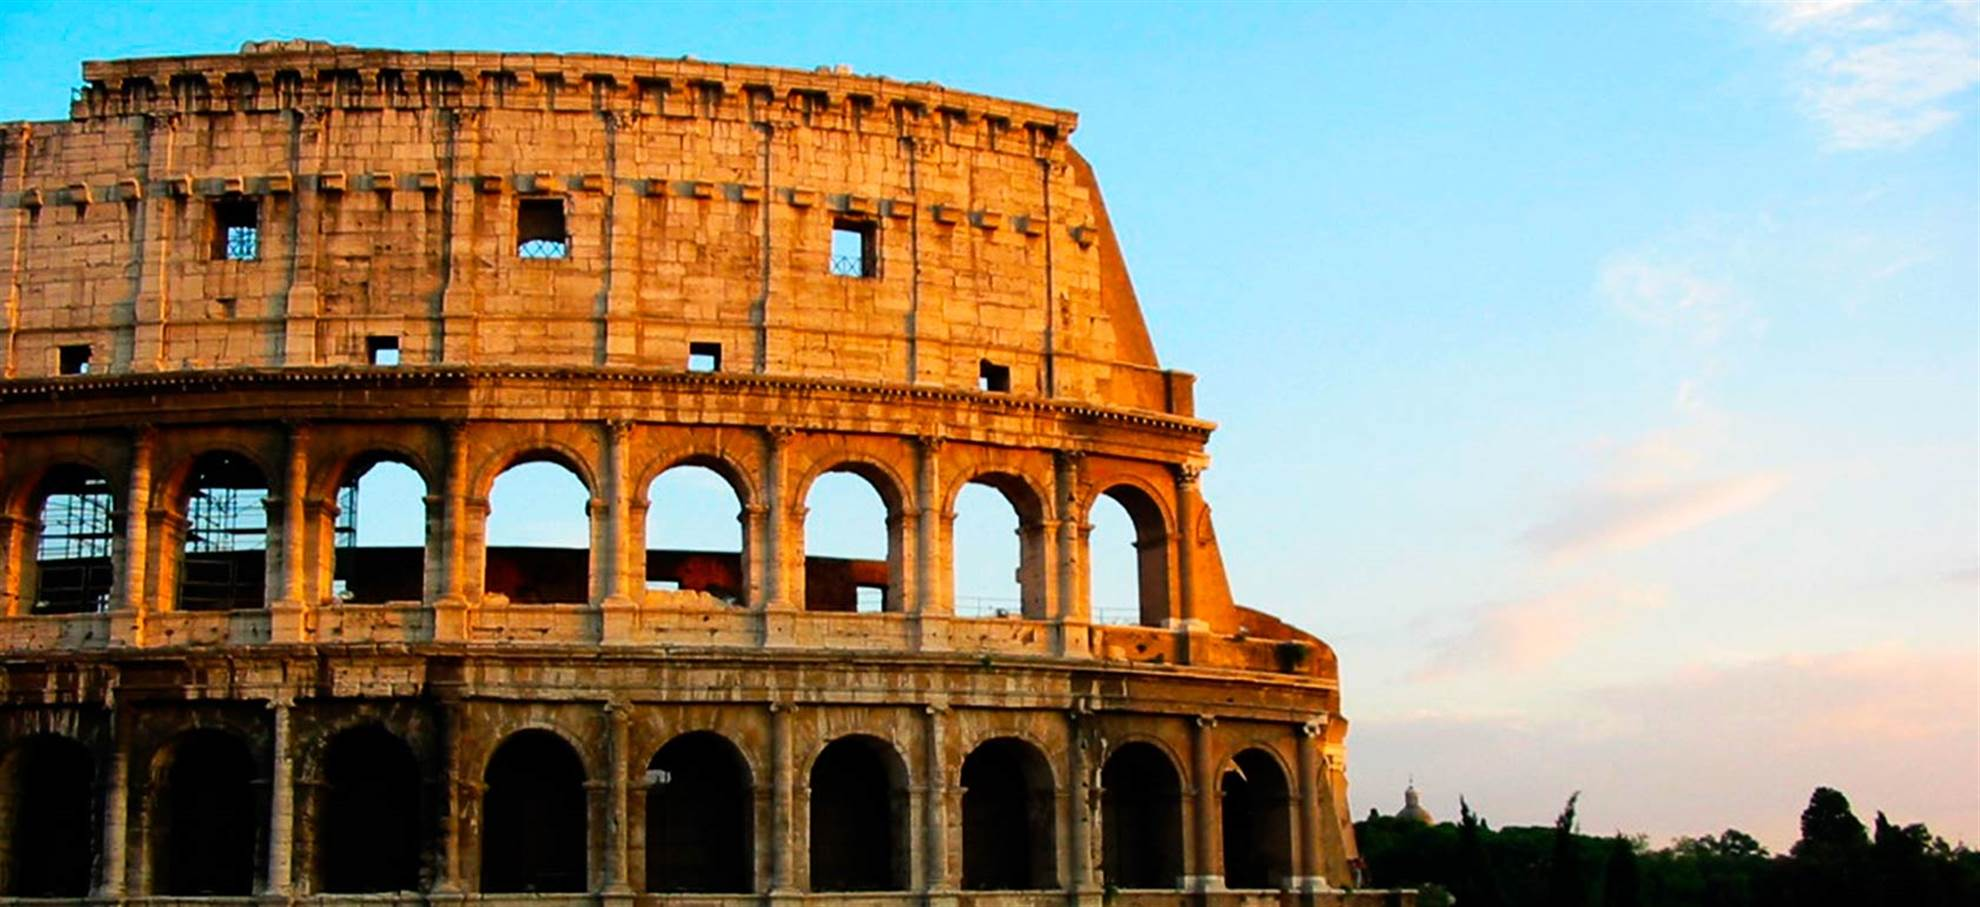 Colosseum, Forum Romanum & Palatinerhøjen +Guide